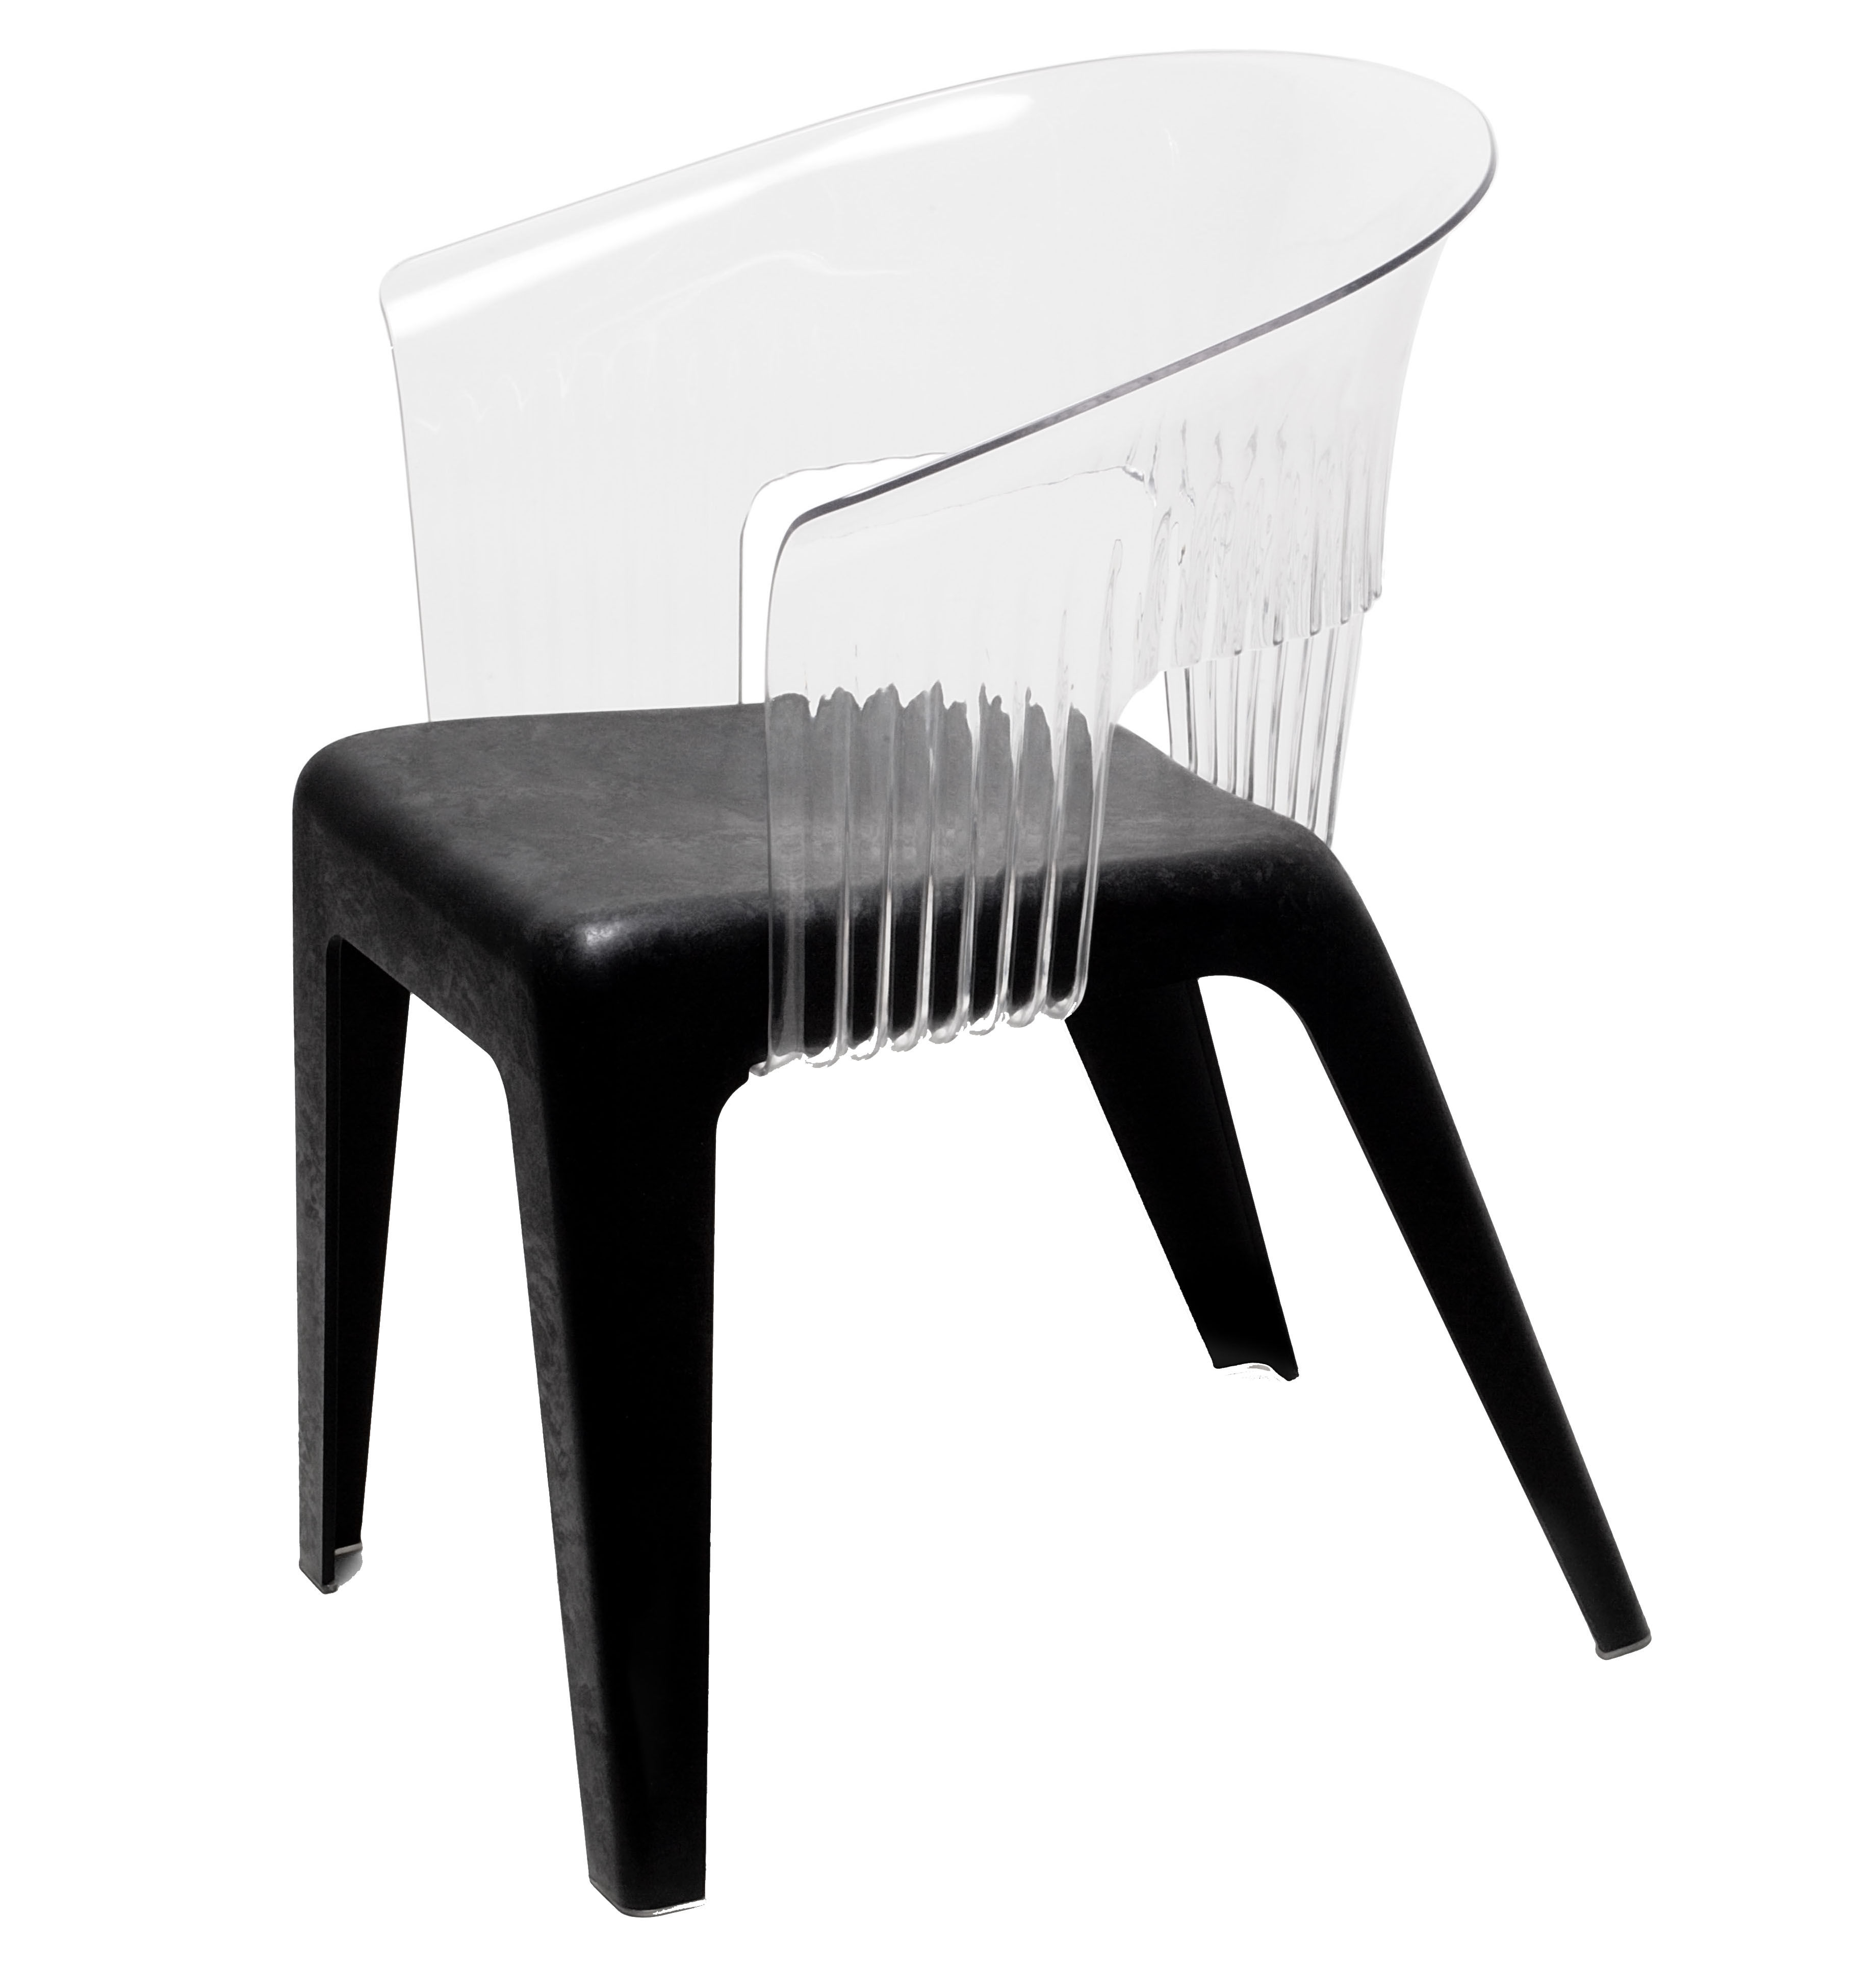 Möbel - Stühle  - Madeira Sessel - Skitsch - Rückenlehne transparent - Sitzfläche schwarz - Fibres de bois, Polykarbonat, Polypropylen